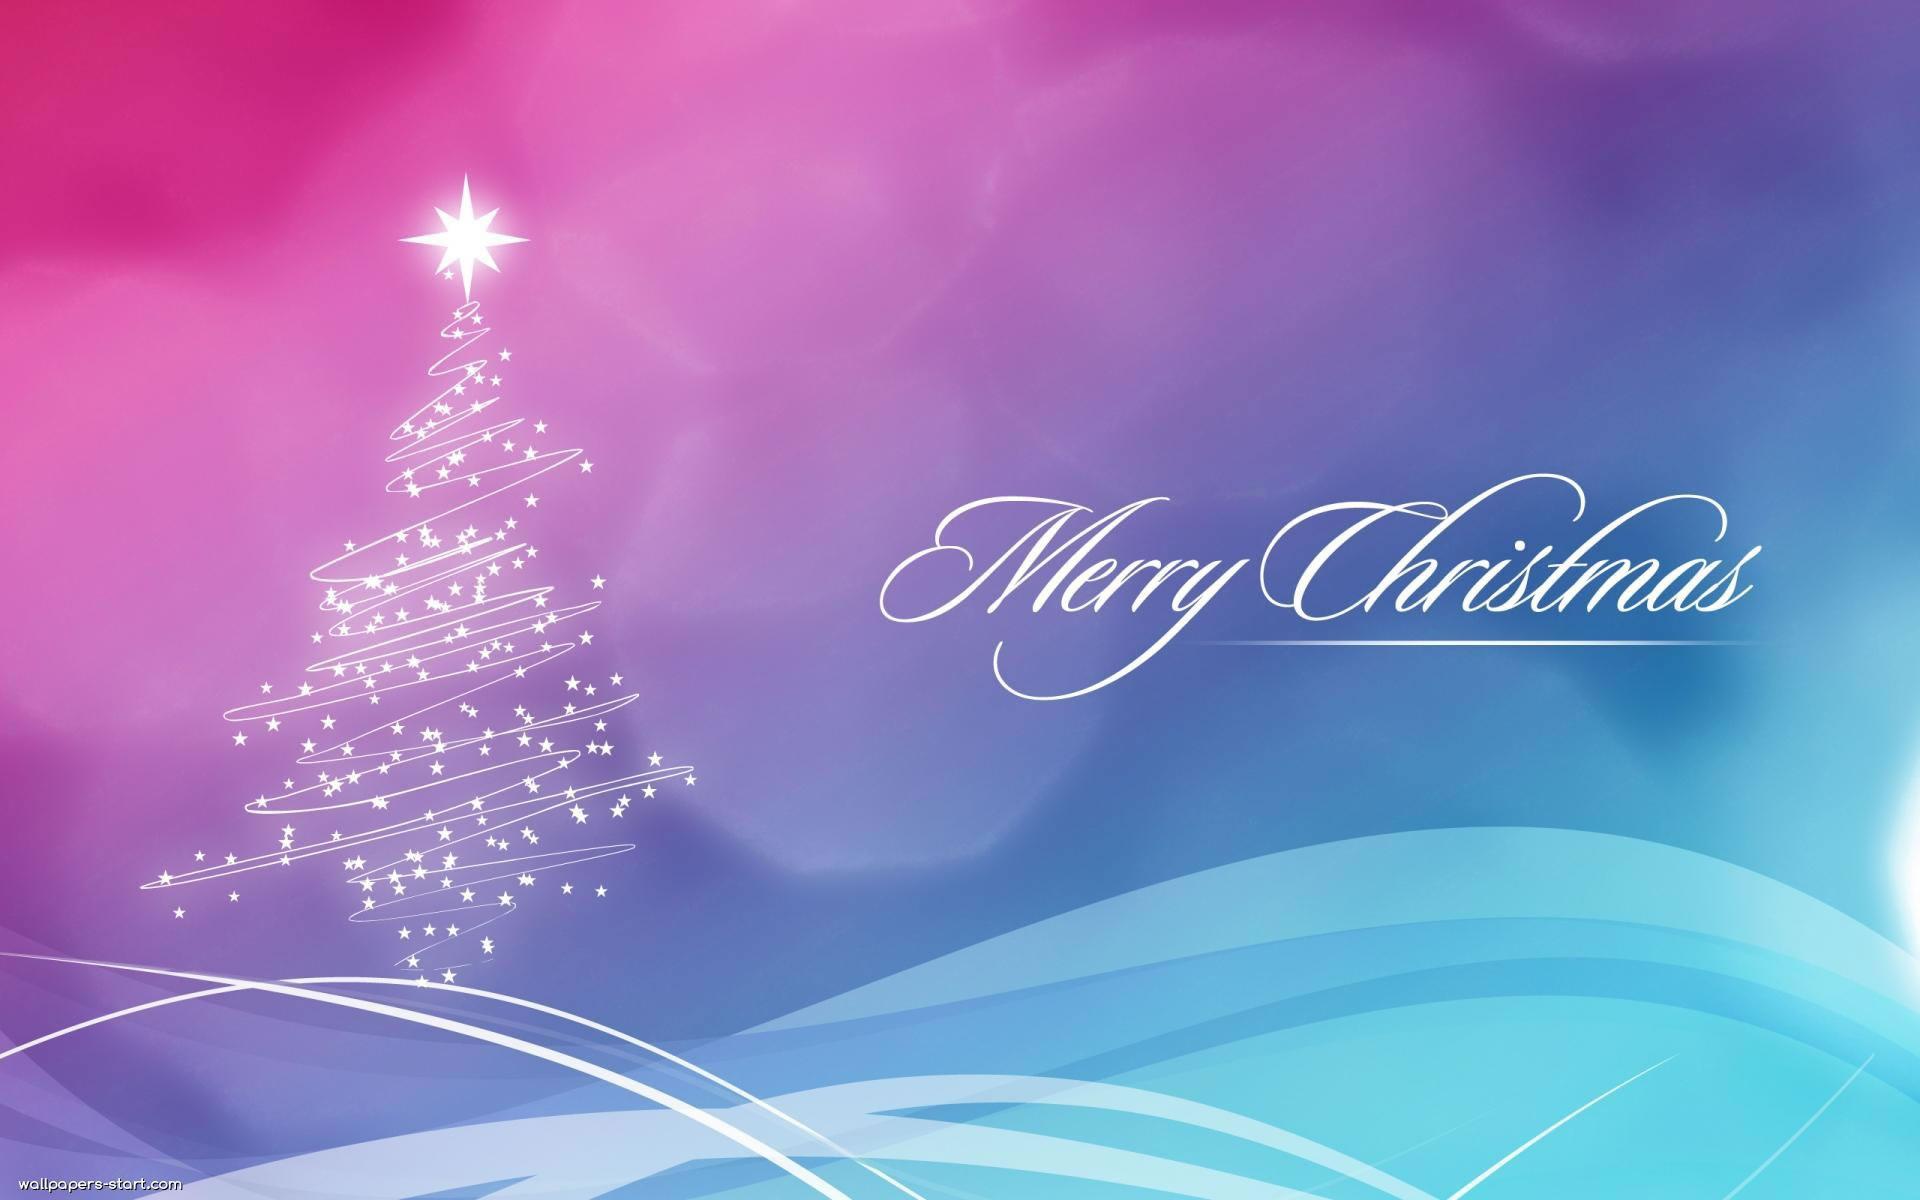 Wallpaper de Navidada en tonos suaves